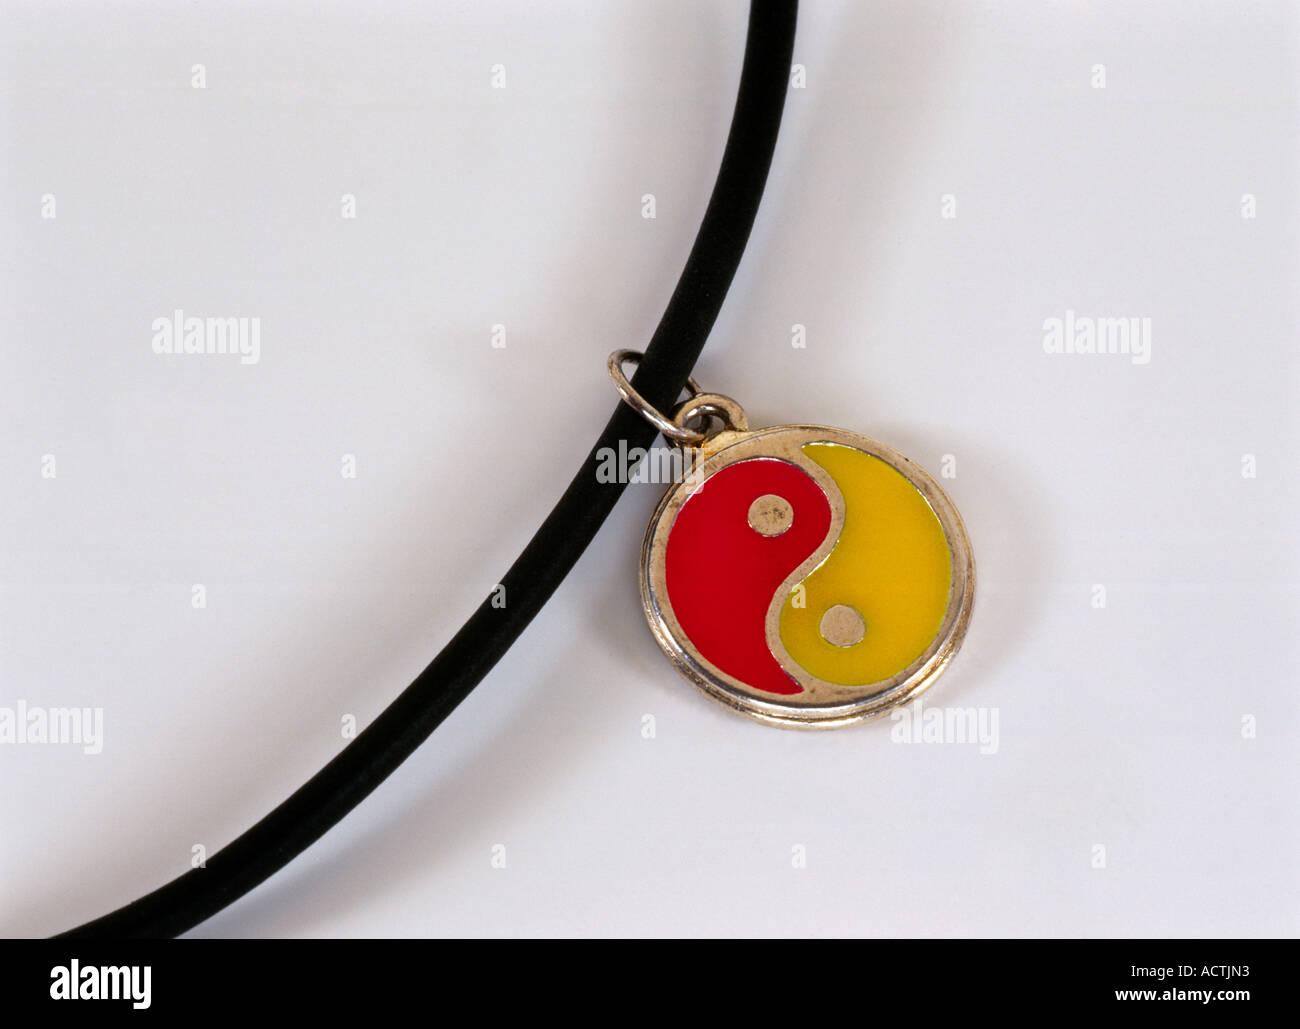 Zen Ying Yang simbolo Taoismo Immagini Stock